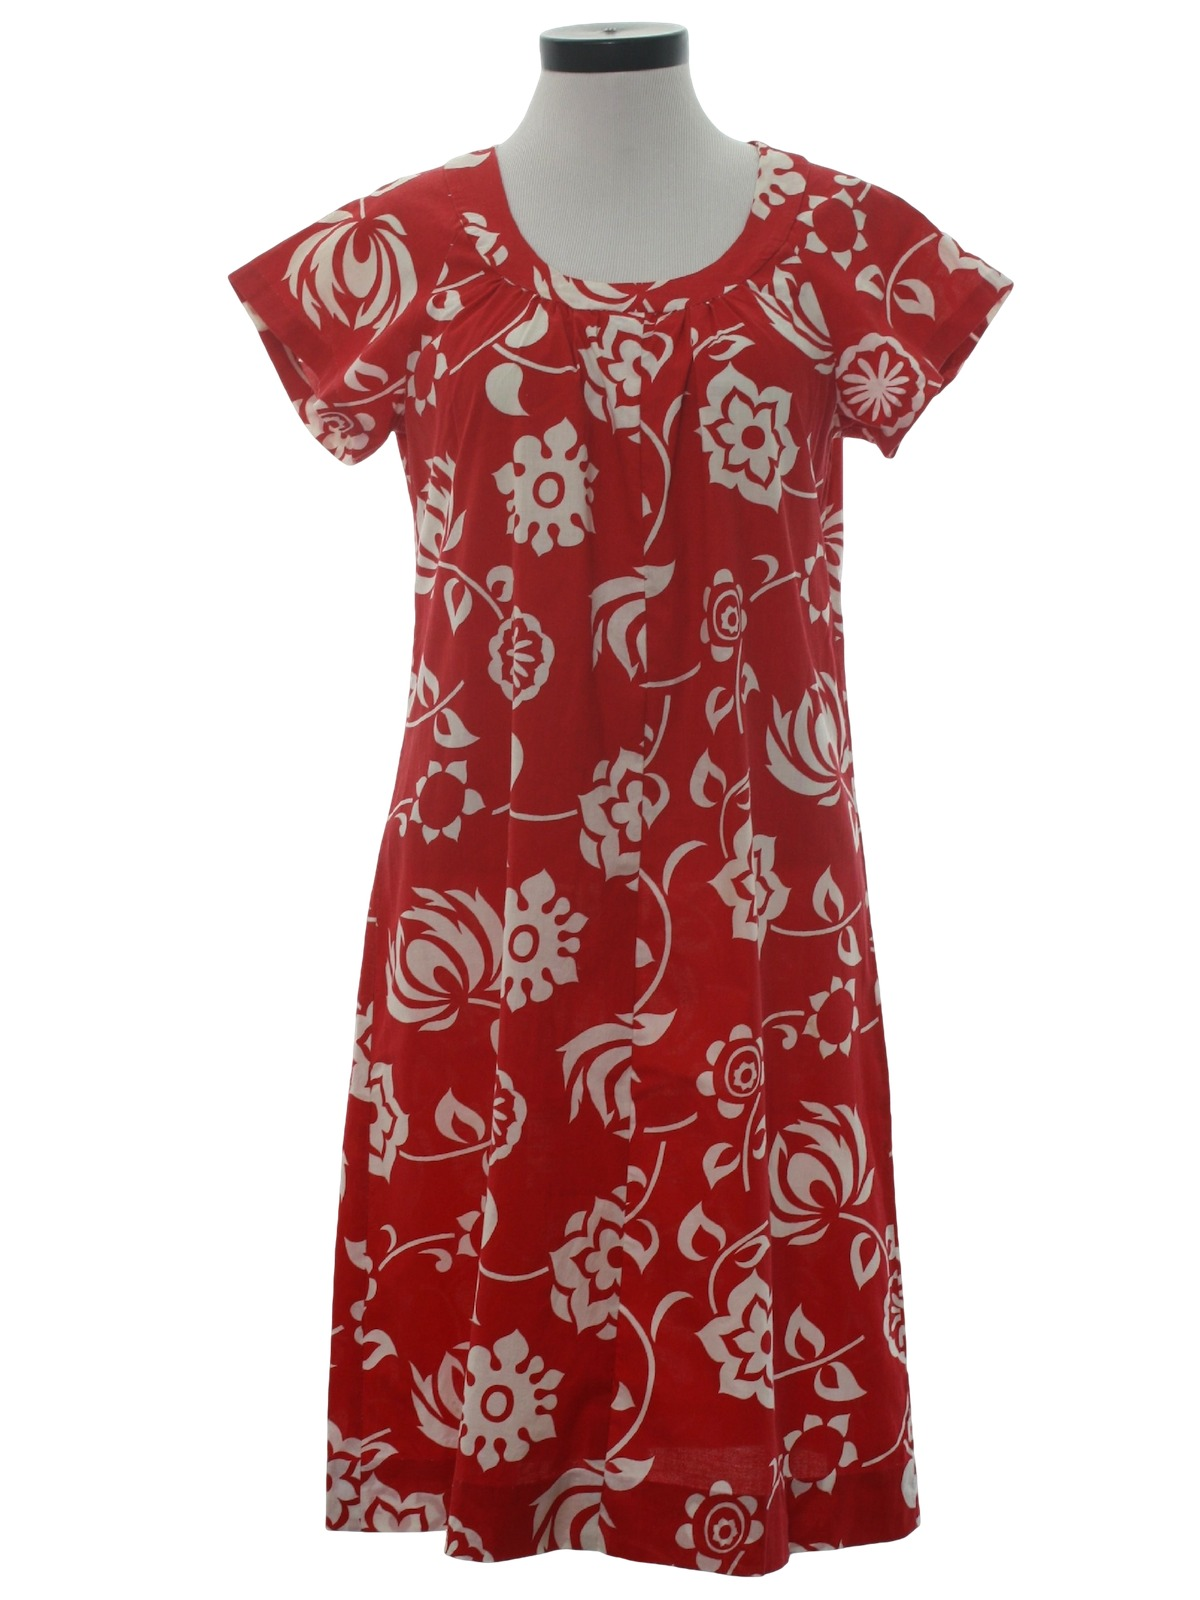 Vintage 1960 S Hawaiian Dress 60s Home Sewn Womens Red